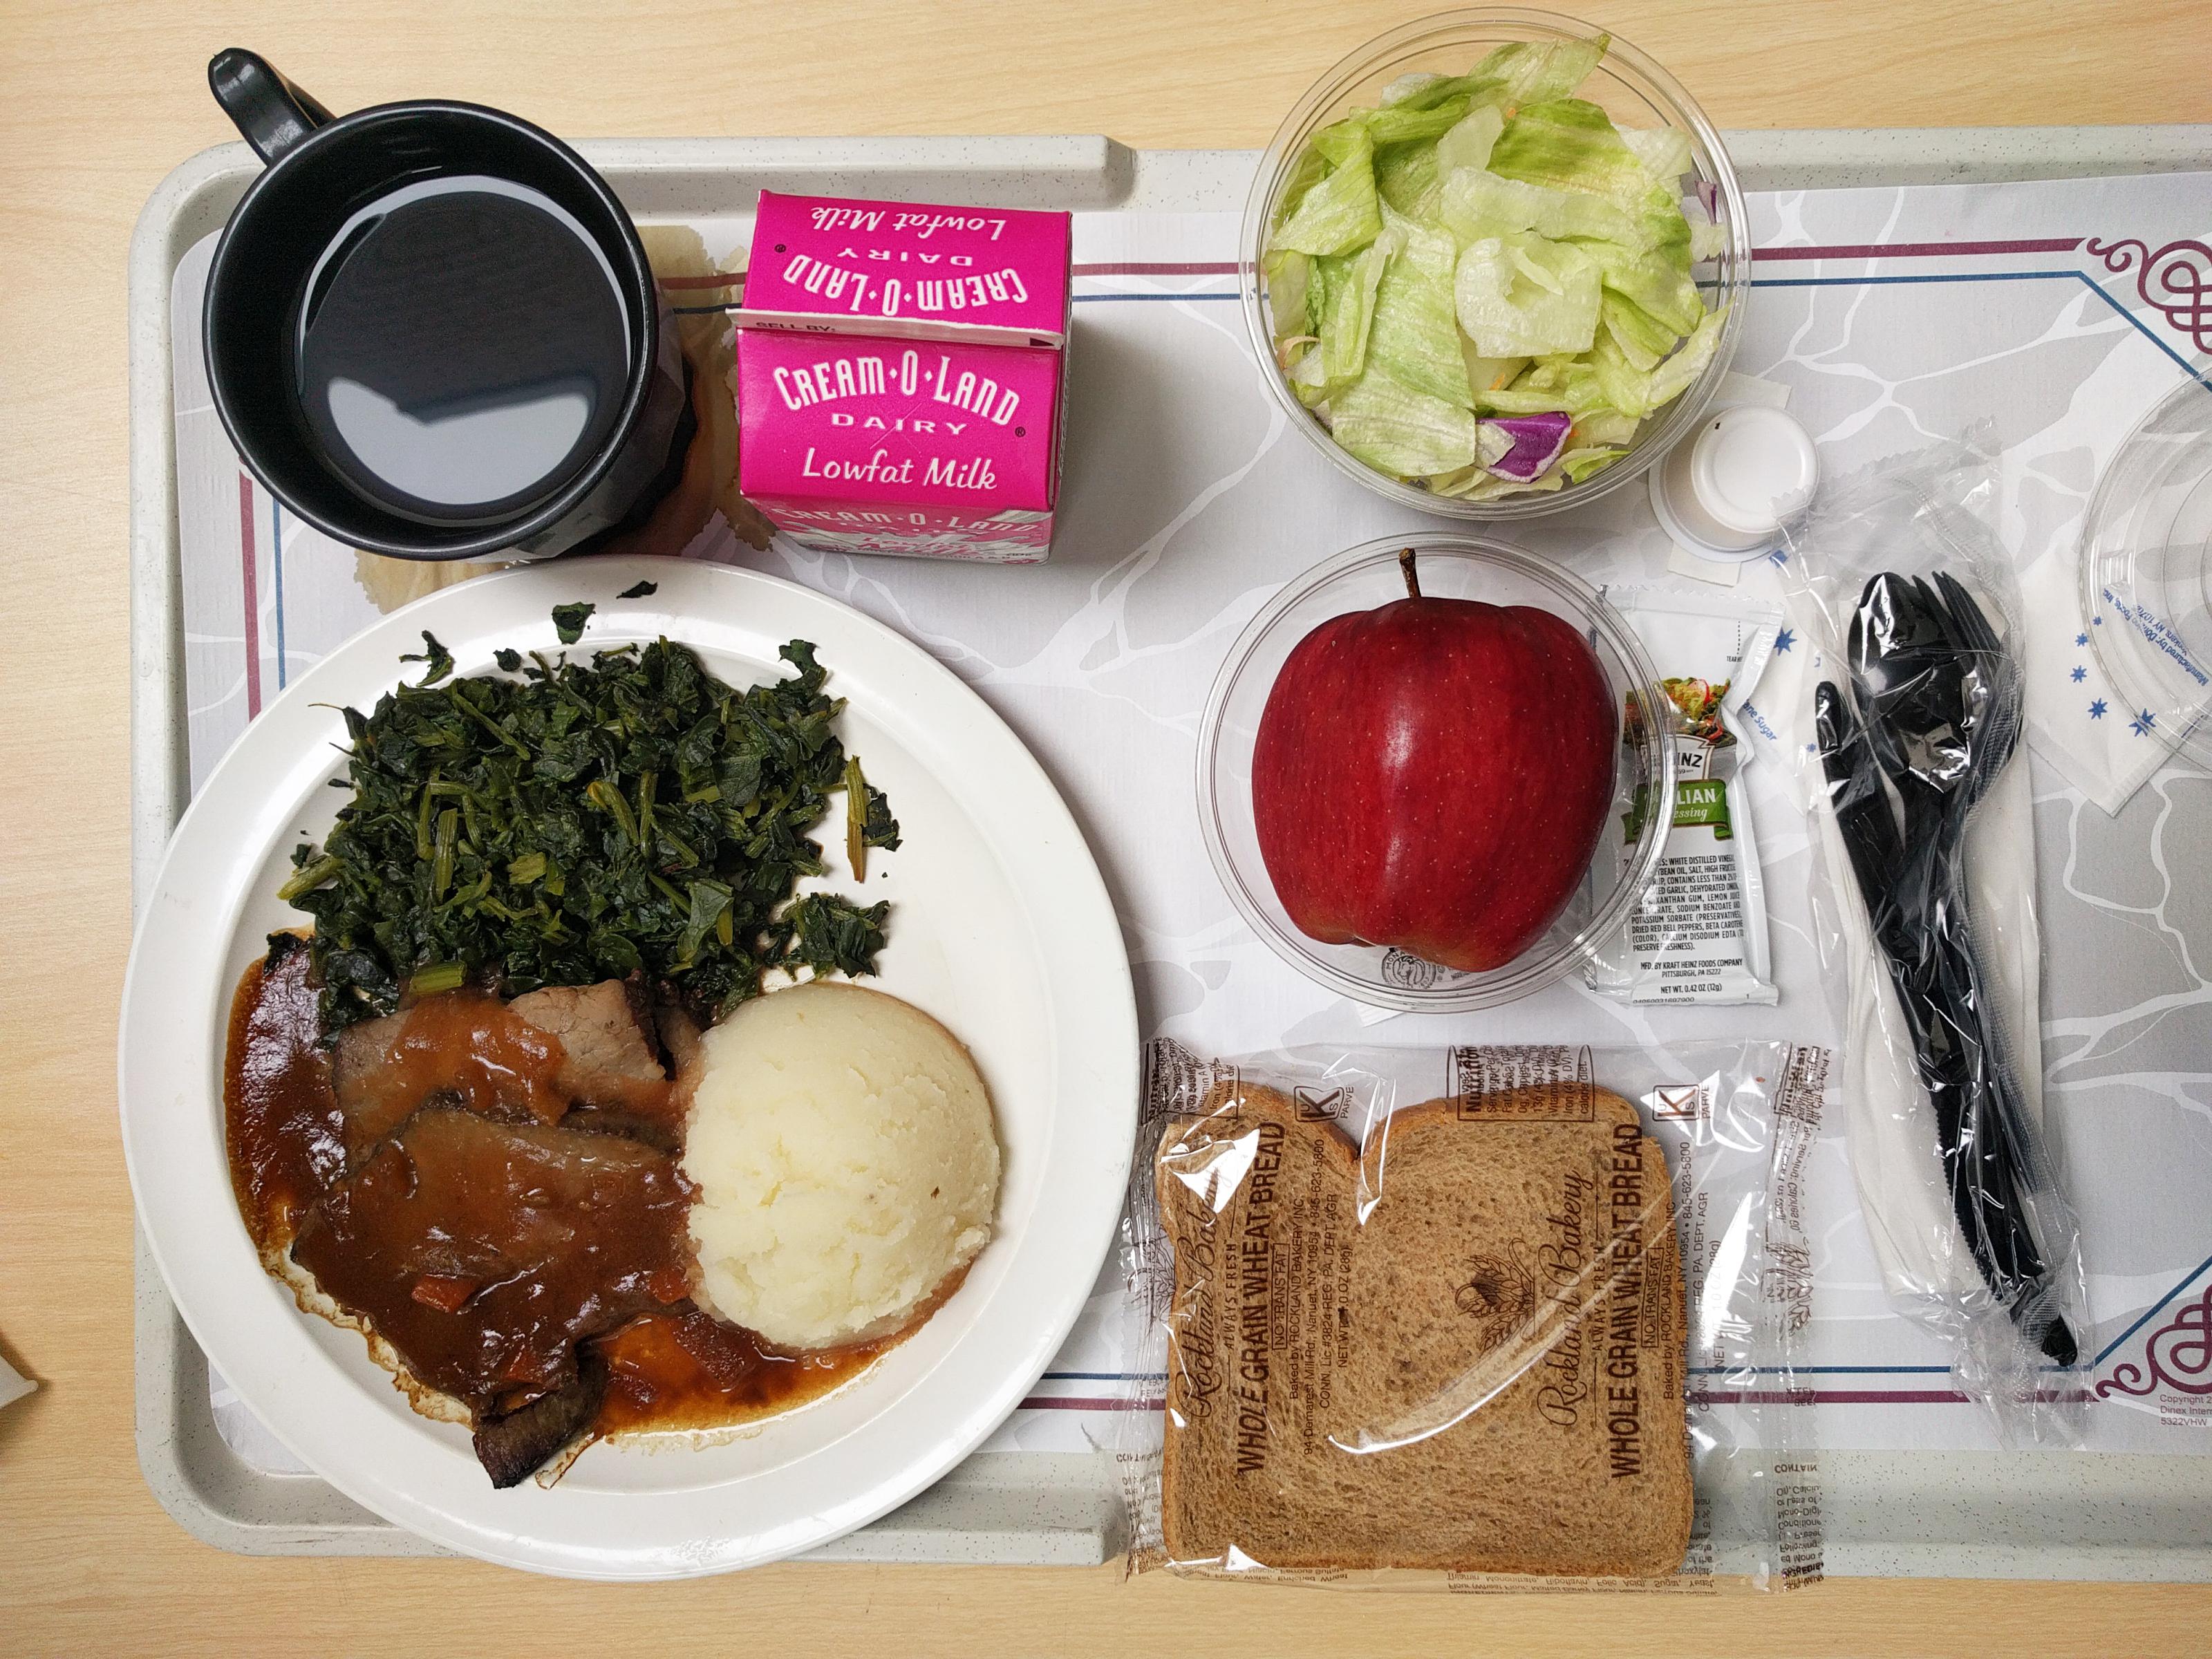 Roast beef dinner at Bellevue Hospital